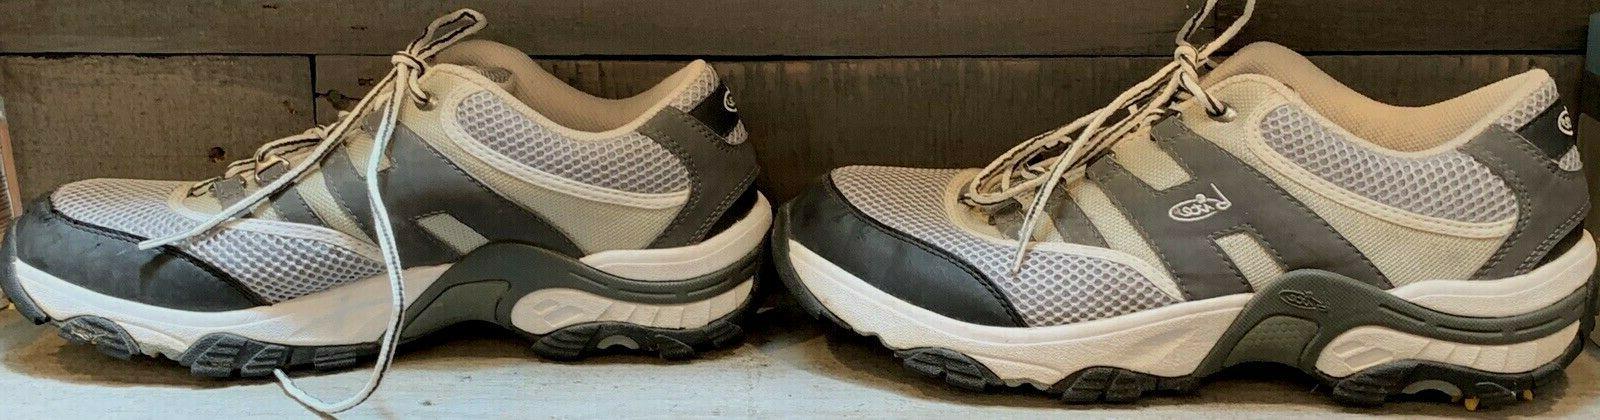 Mens Bite Shoe 10.5 M Sneaker Style 697Z